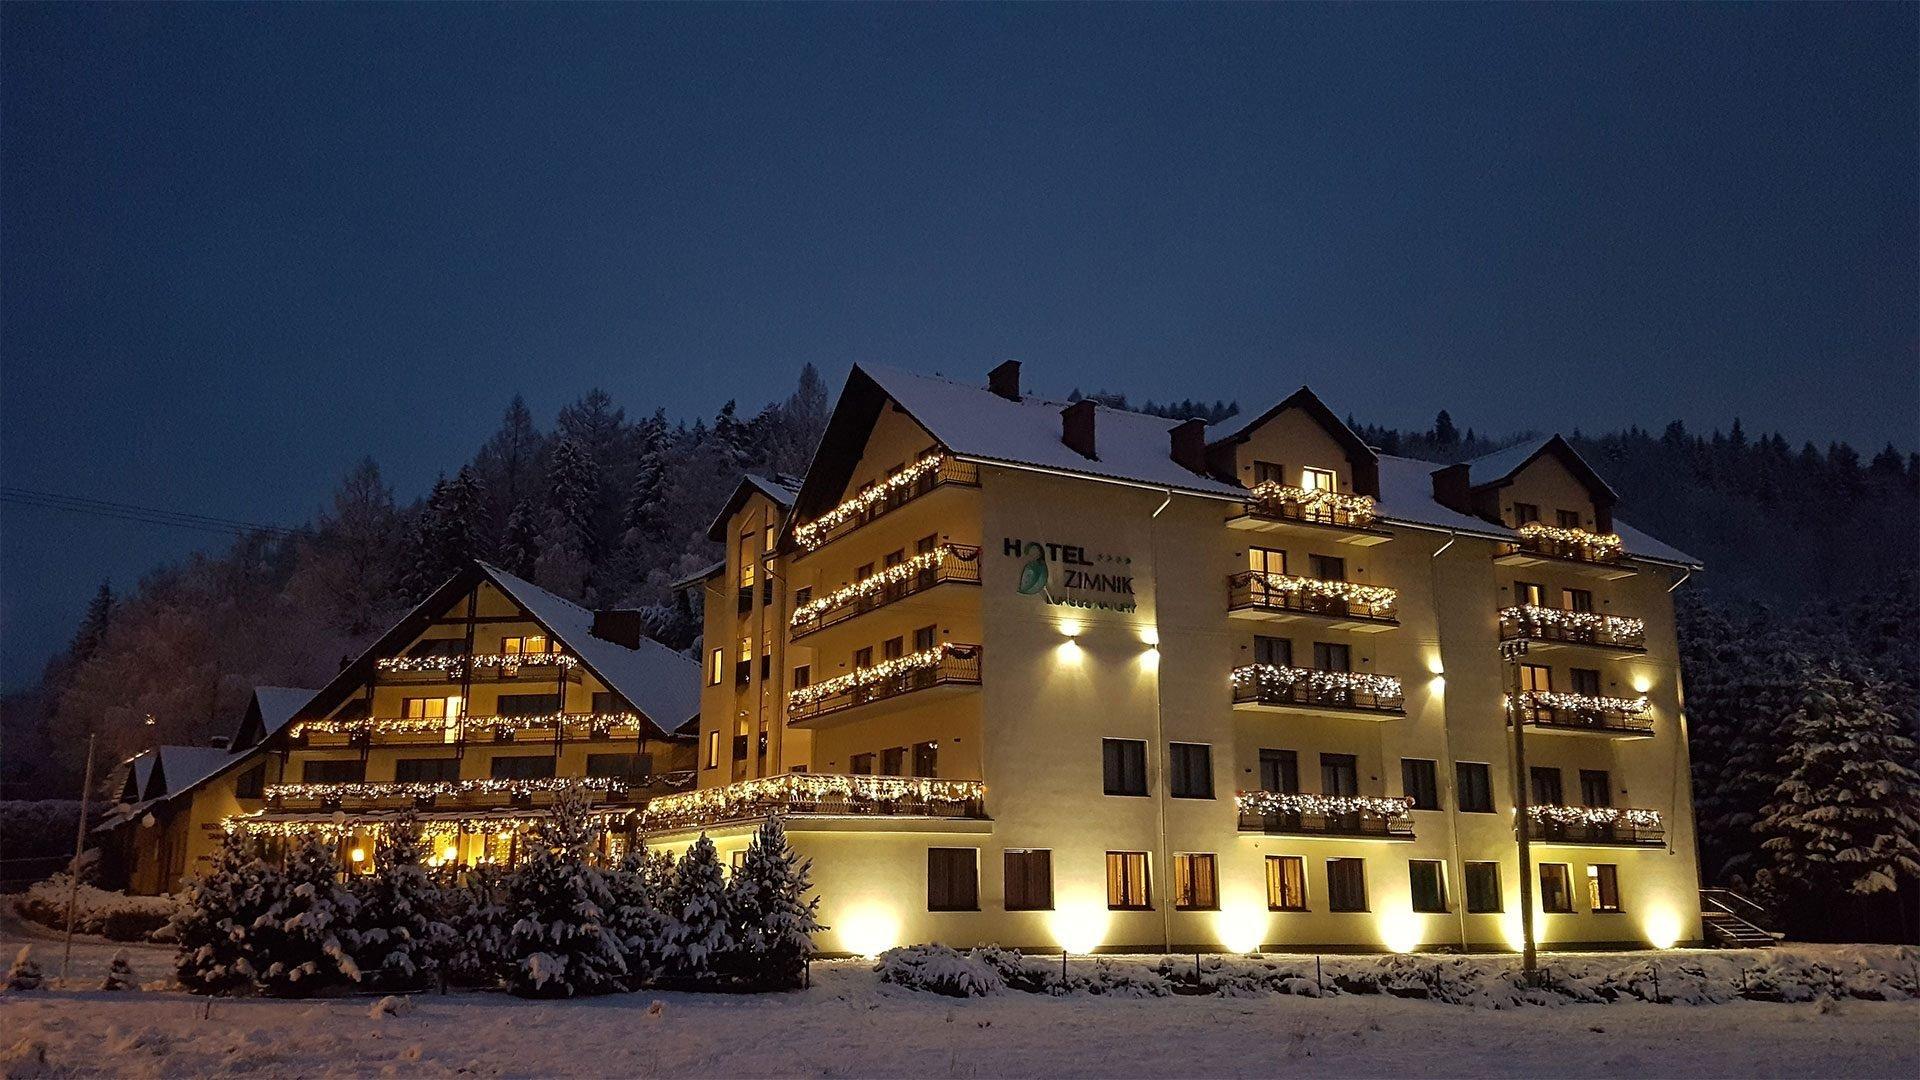 Luksus Natury W Sercu Doliny Zimnika Hotel Zimnik